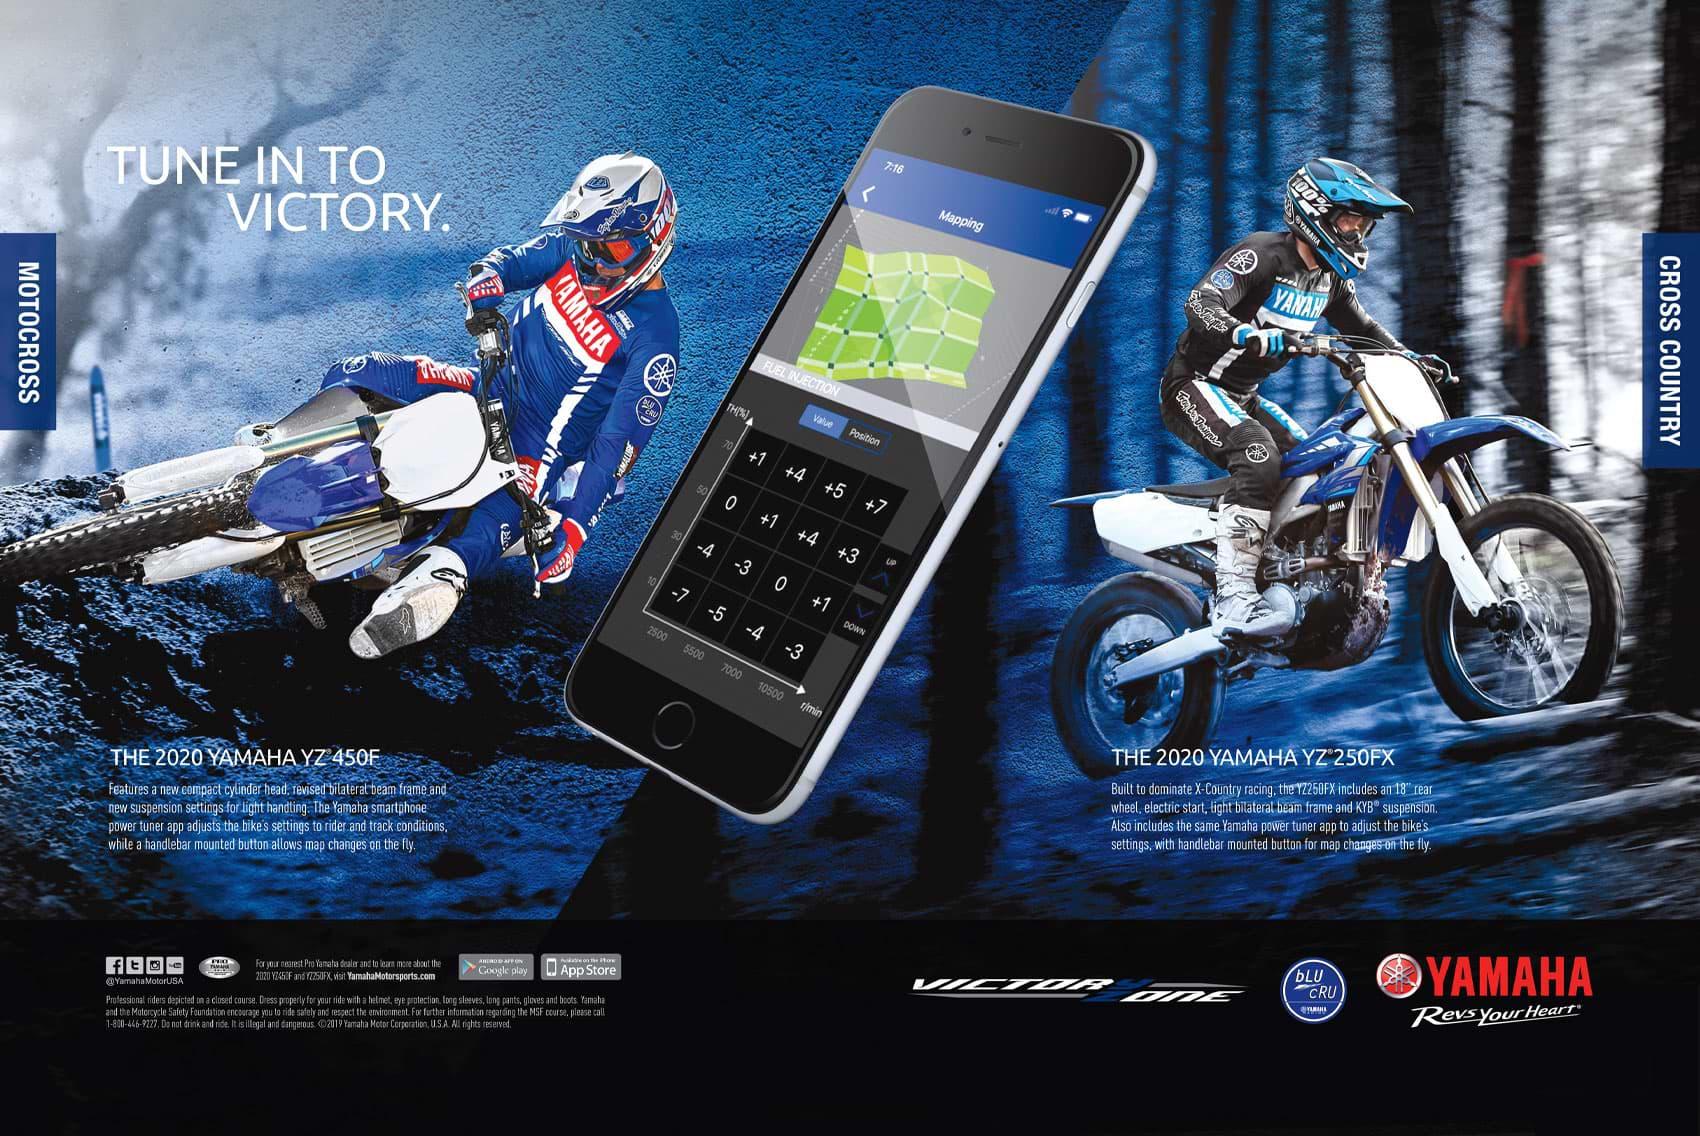 Racer X December 2019 - Yamaha Advertisement